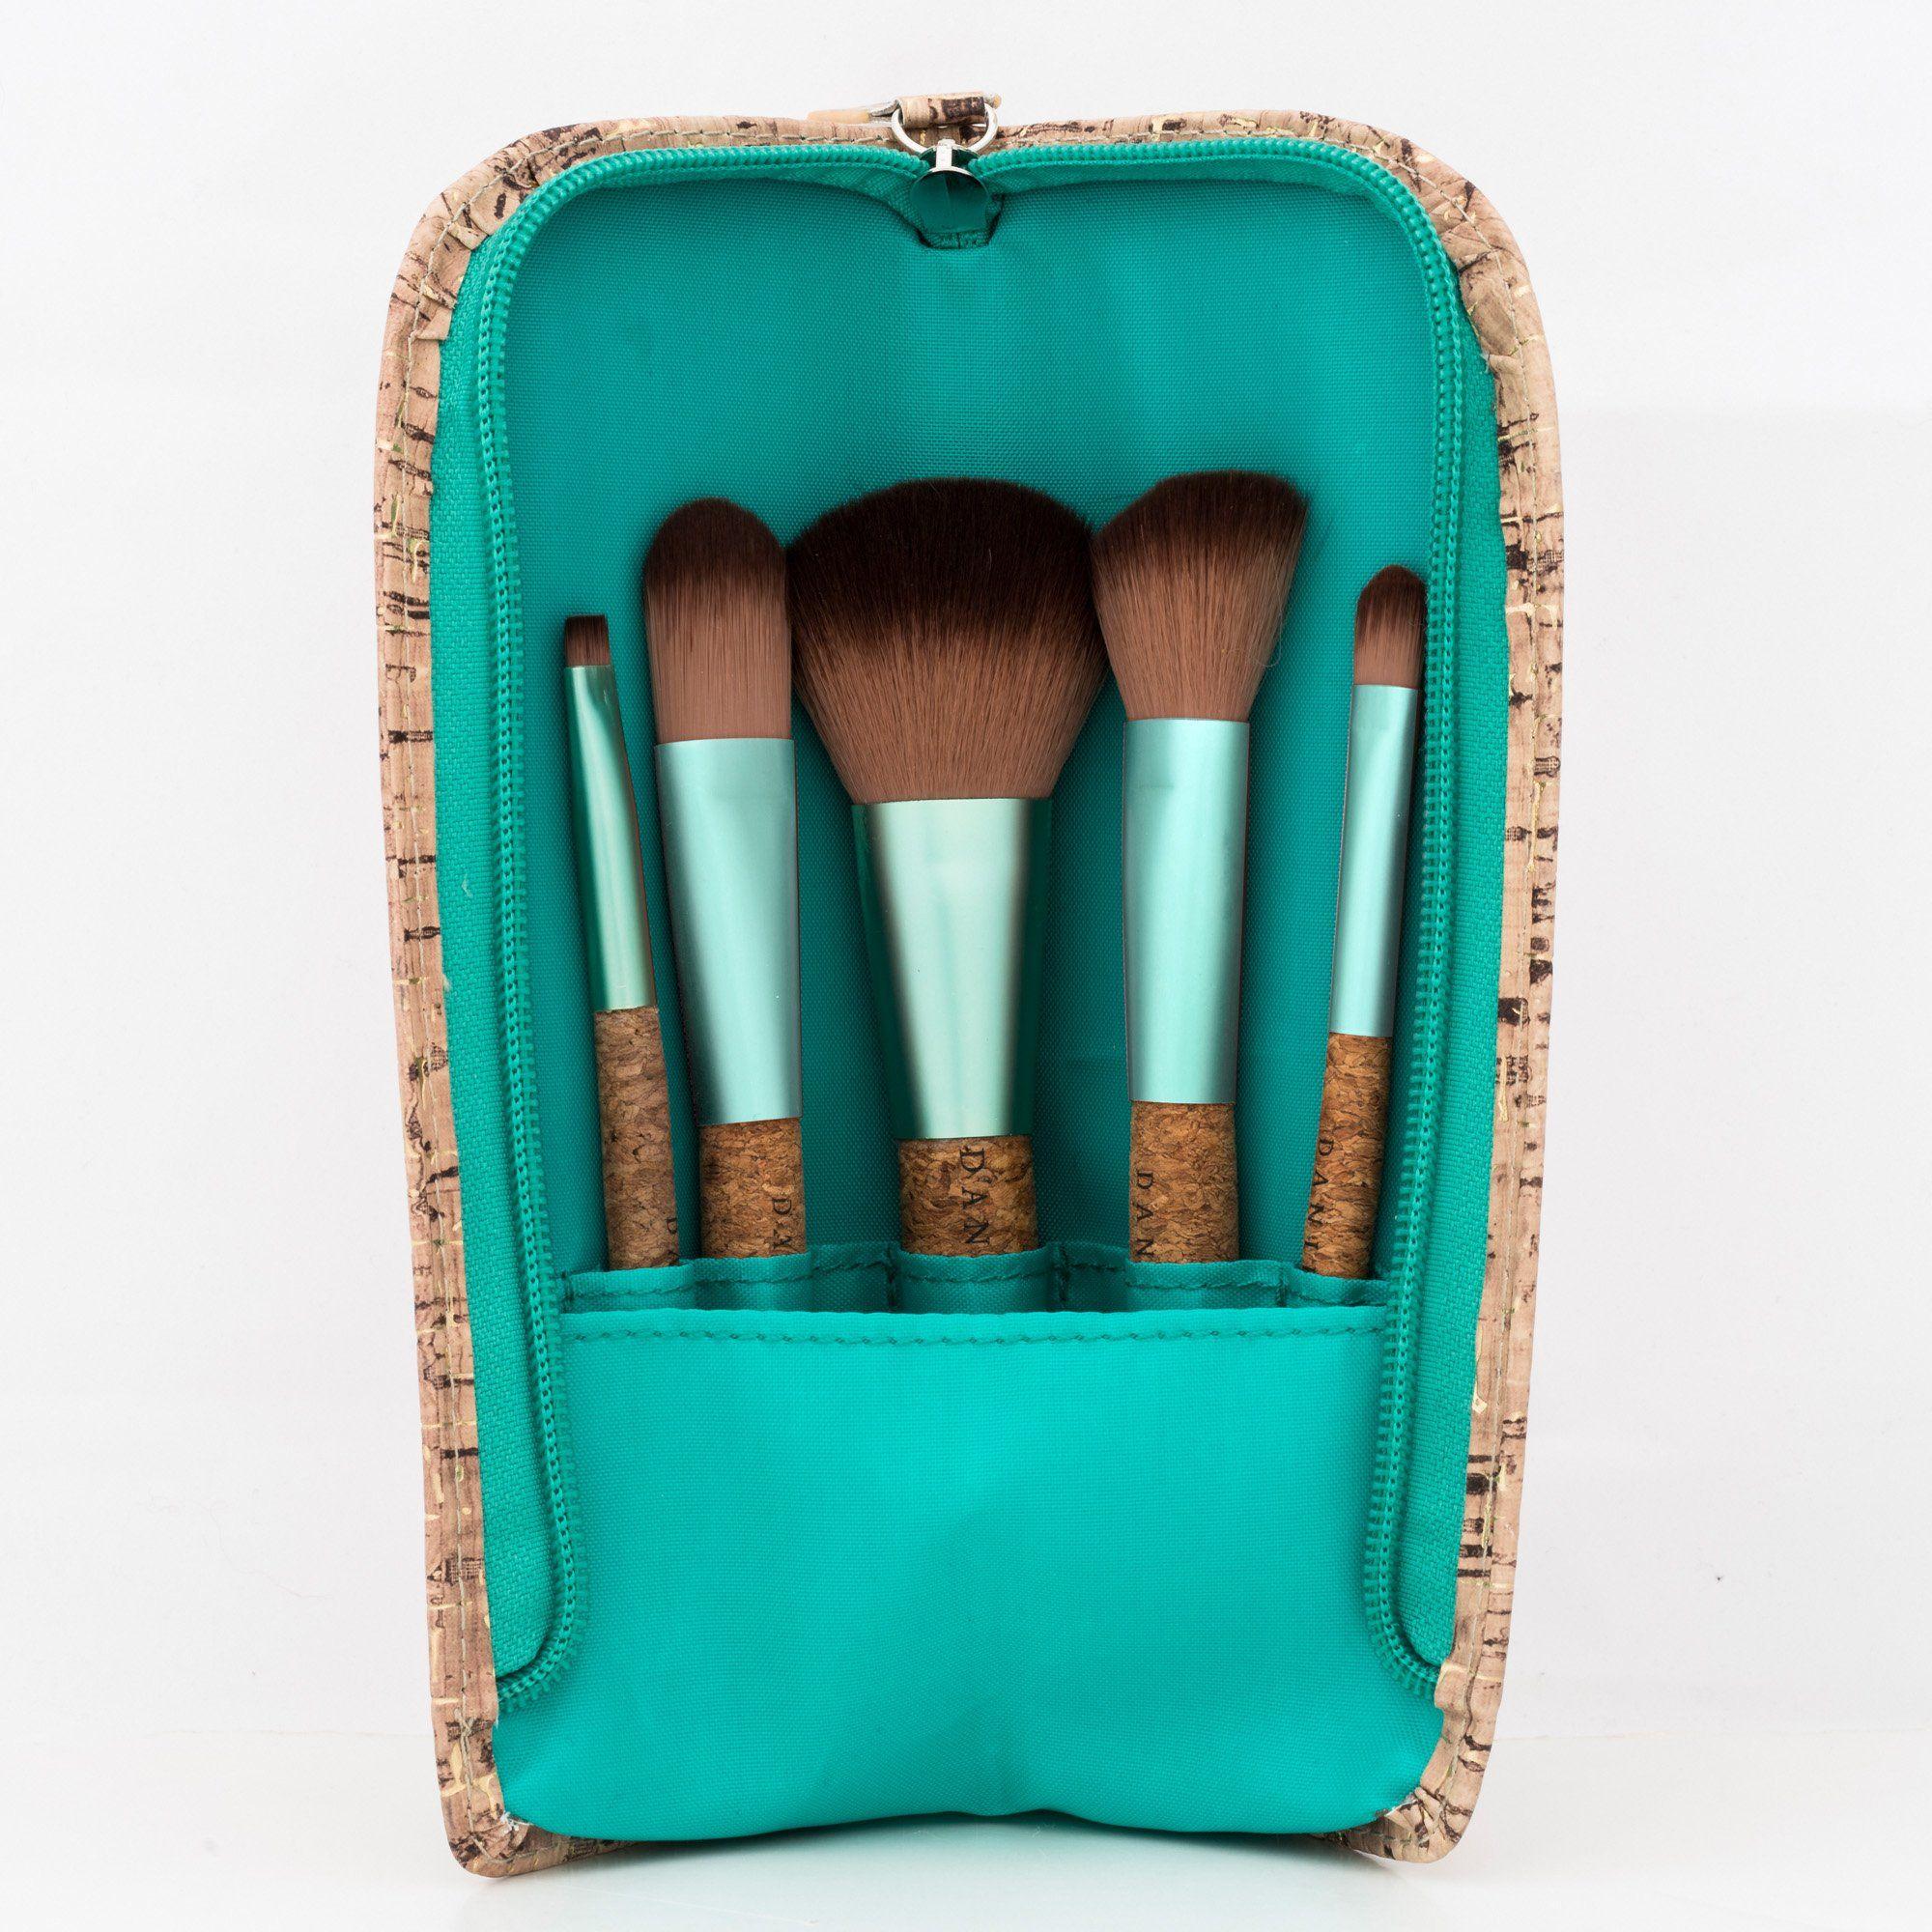 Danielle Creations 6Piece Cork Brush Set, Seafoam Green